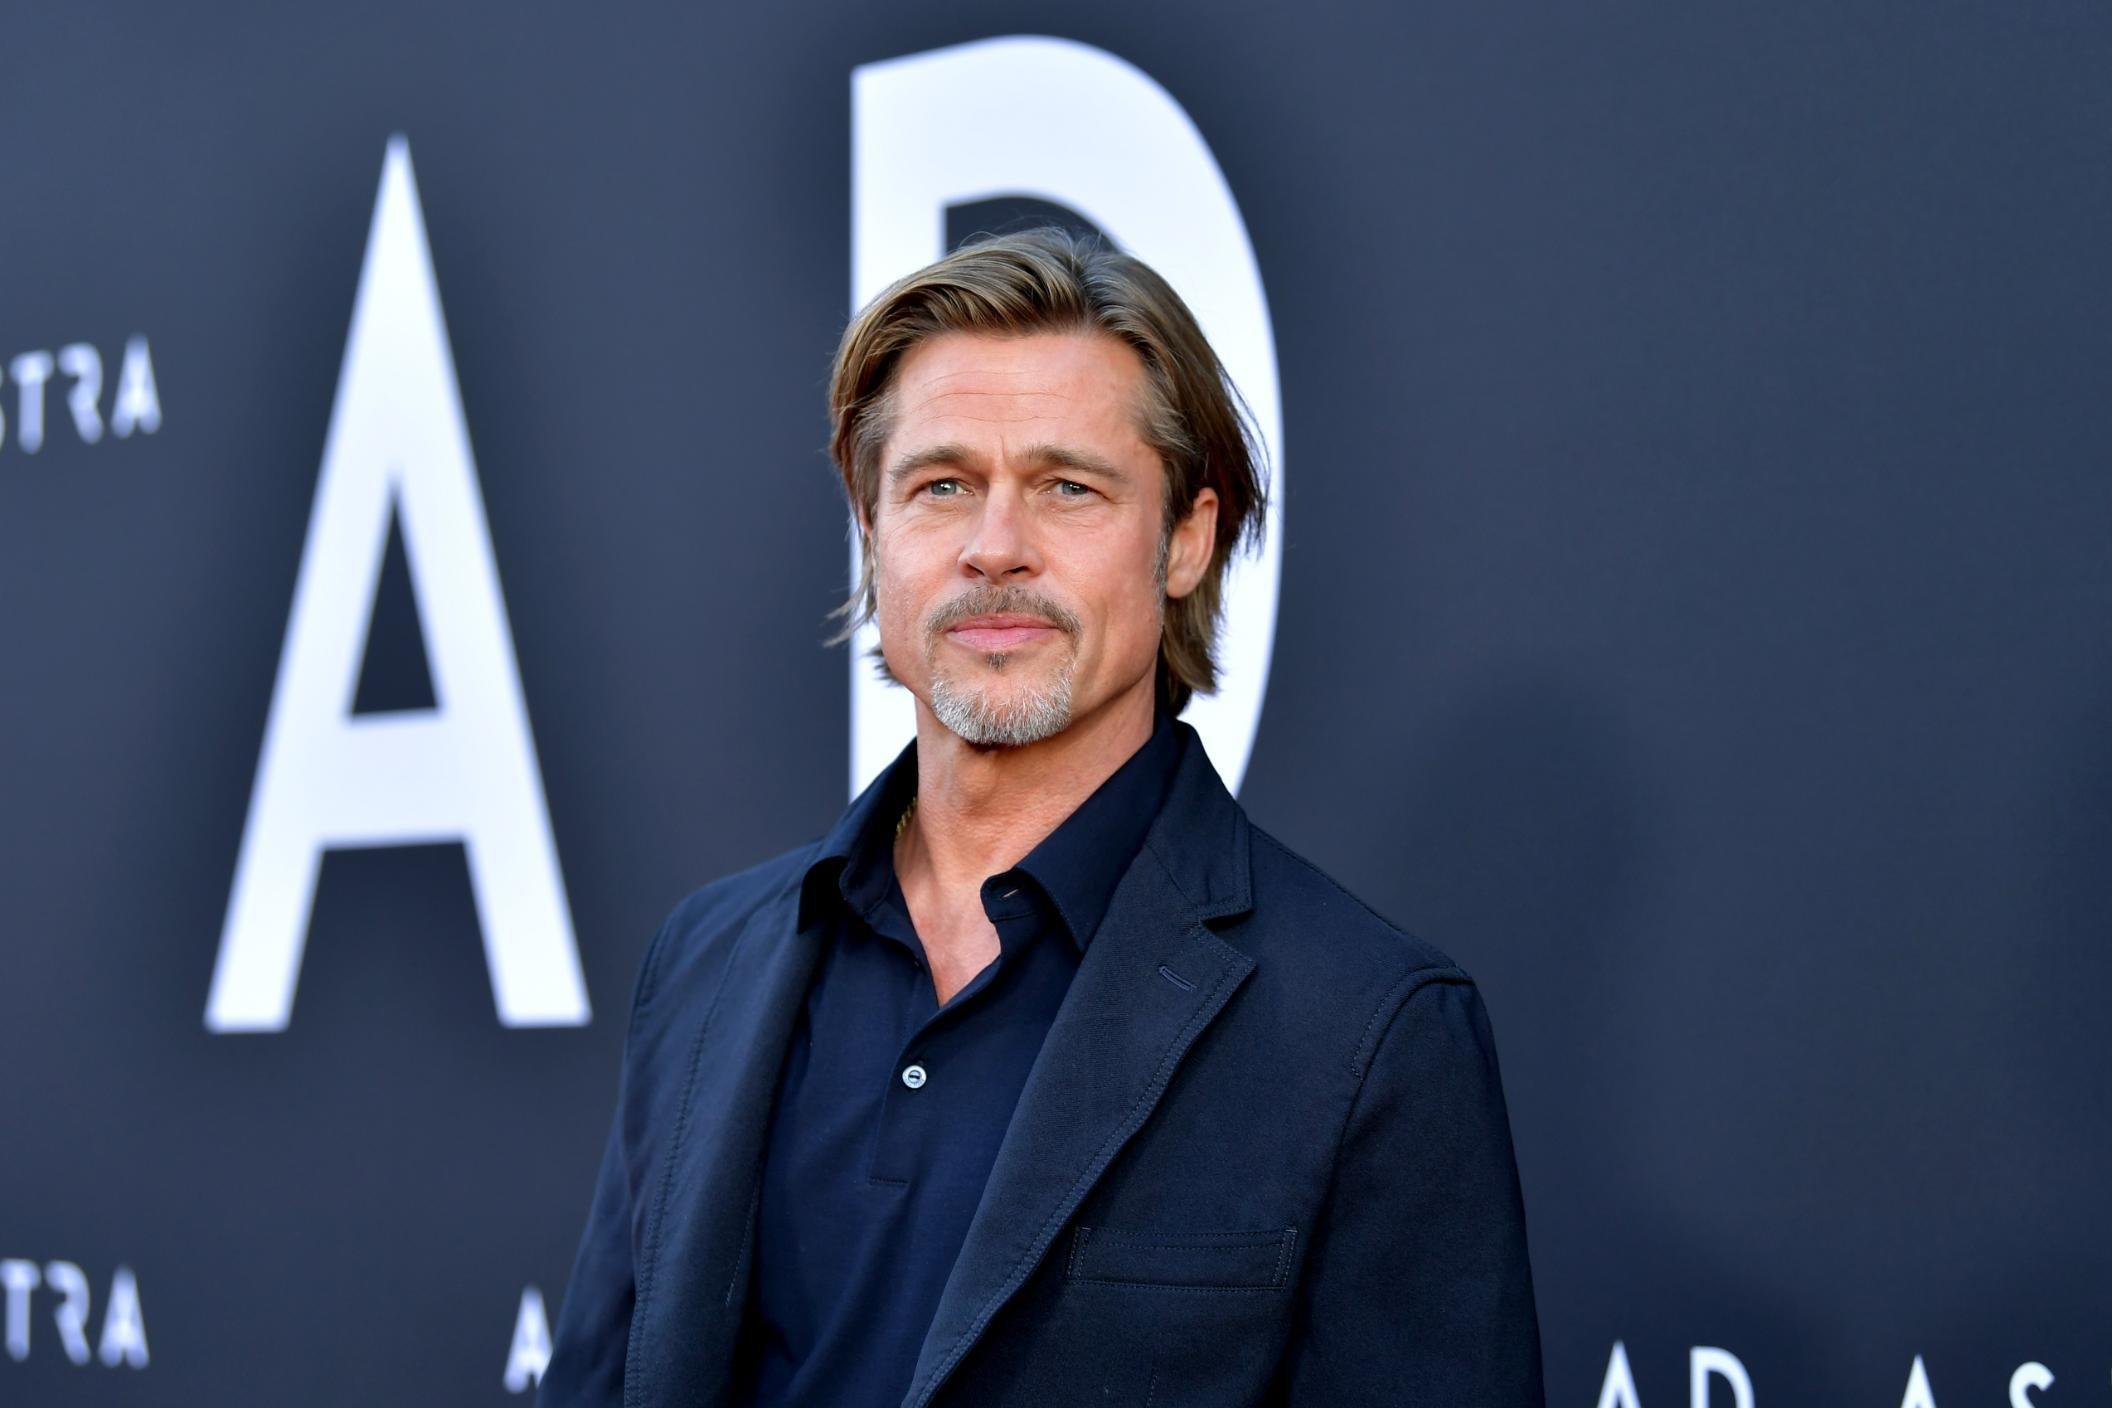 Brad Pitt cries more than he used to